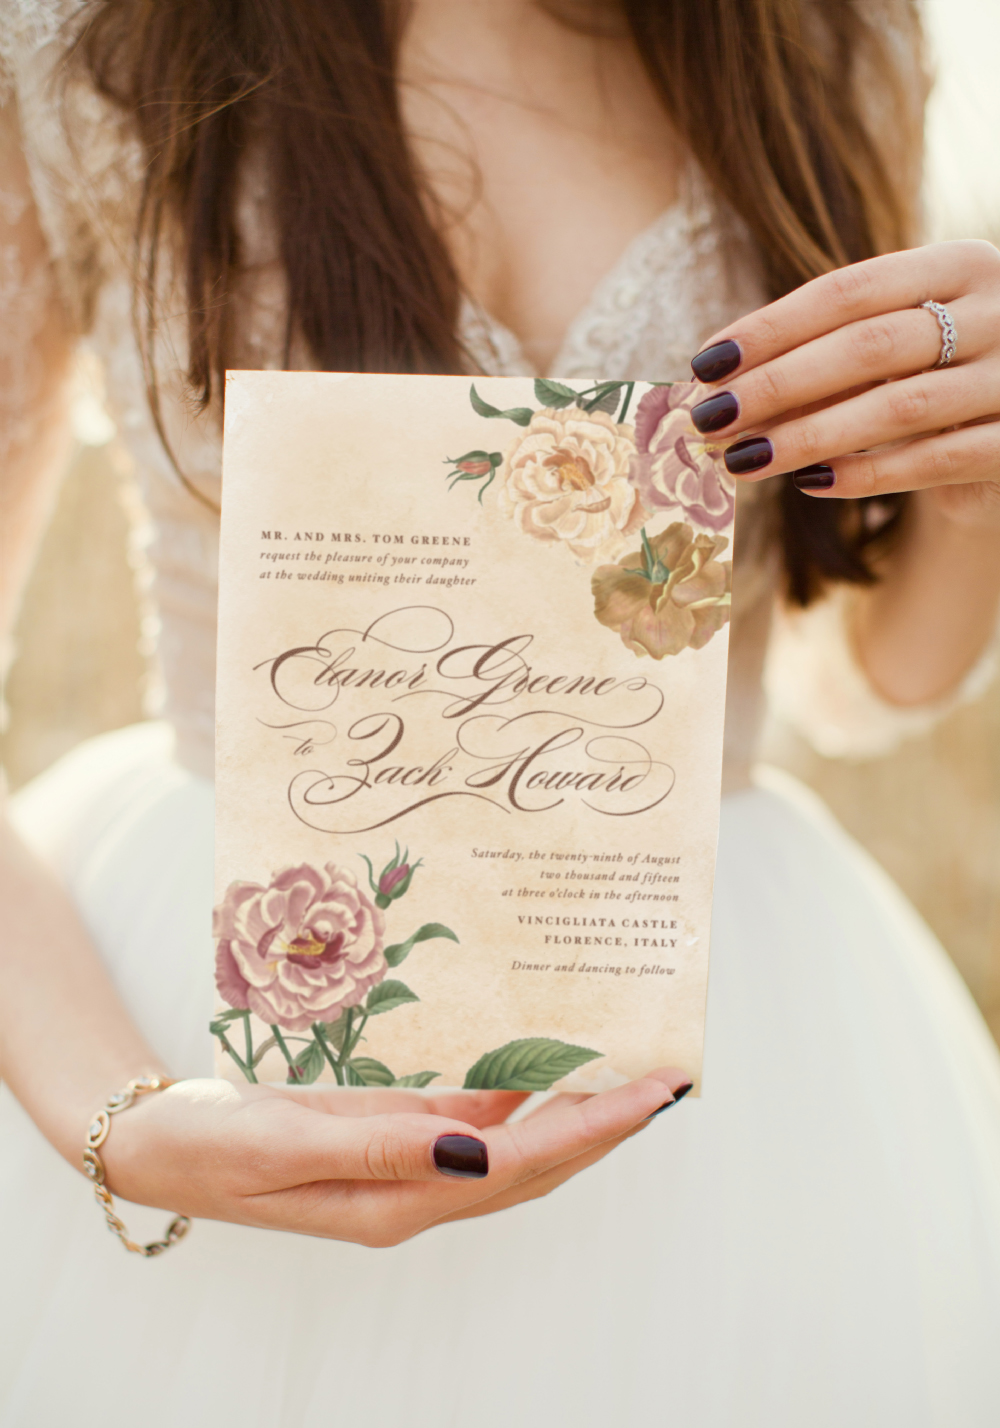 vintage-roses-wedding-invitation-elgant-rose-gold-foil-letterpress-flora-wedding-invitation.jpg